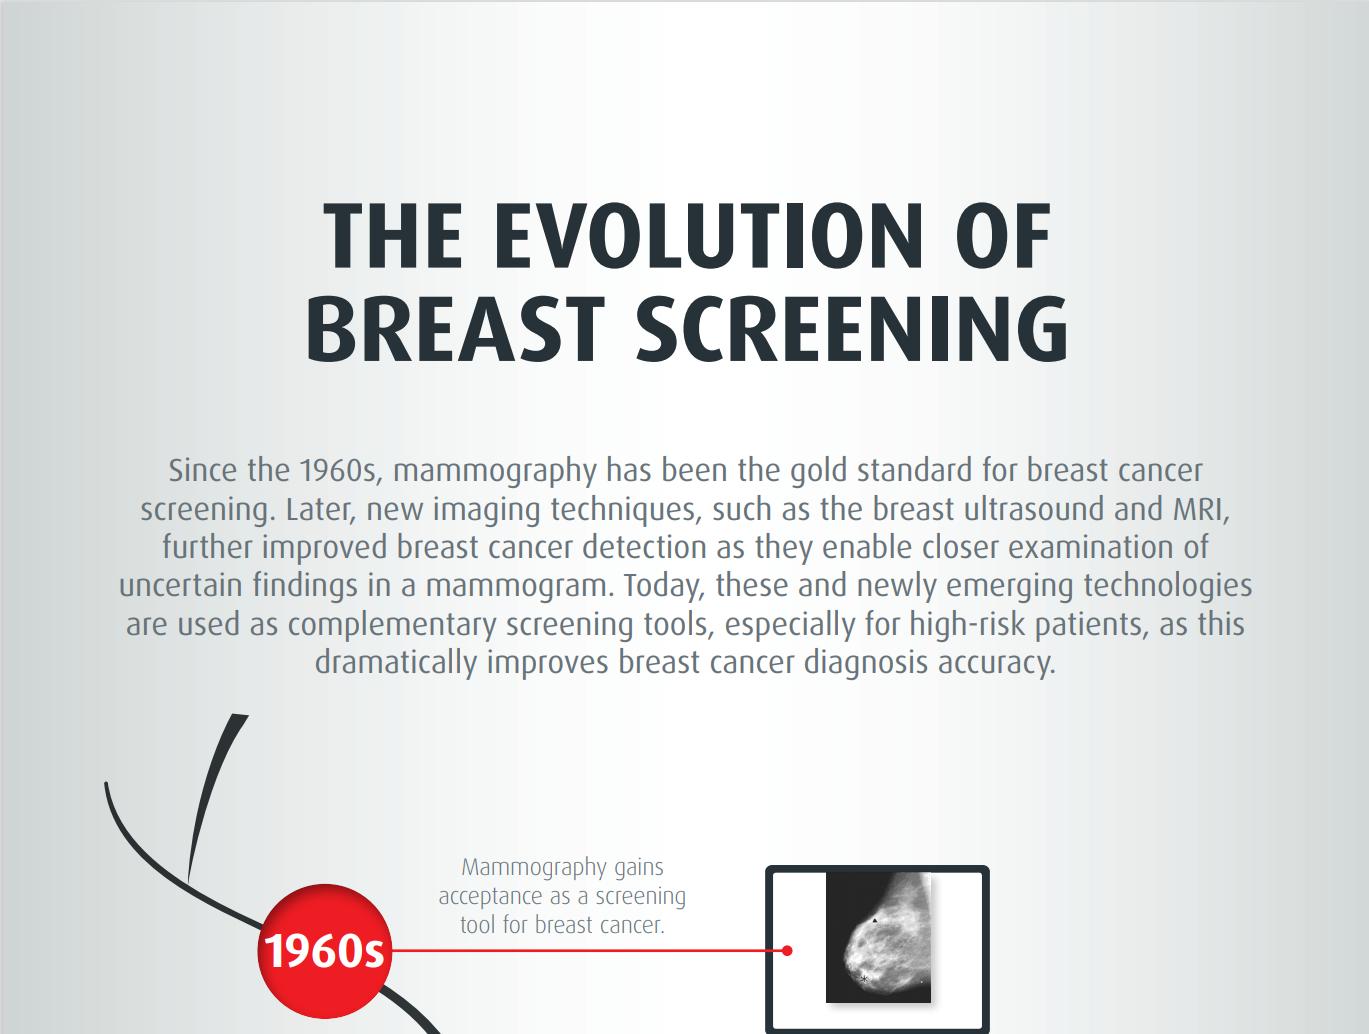 THE EVOLUTION OF BREAST SCREENING